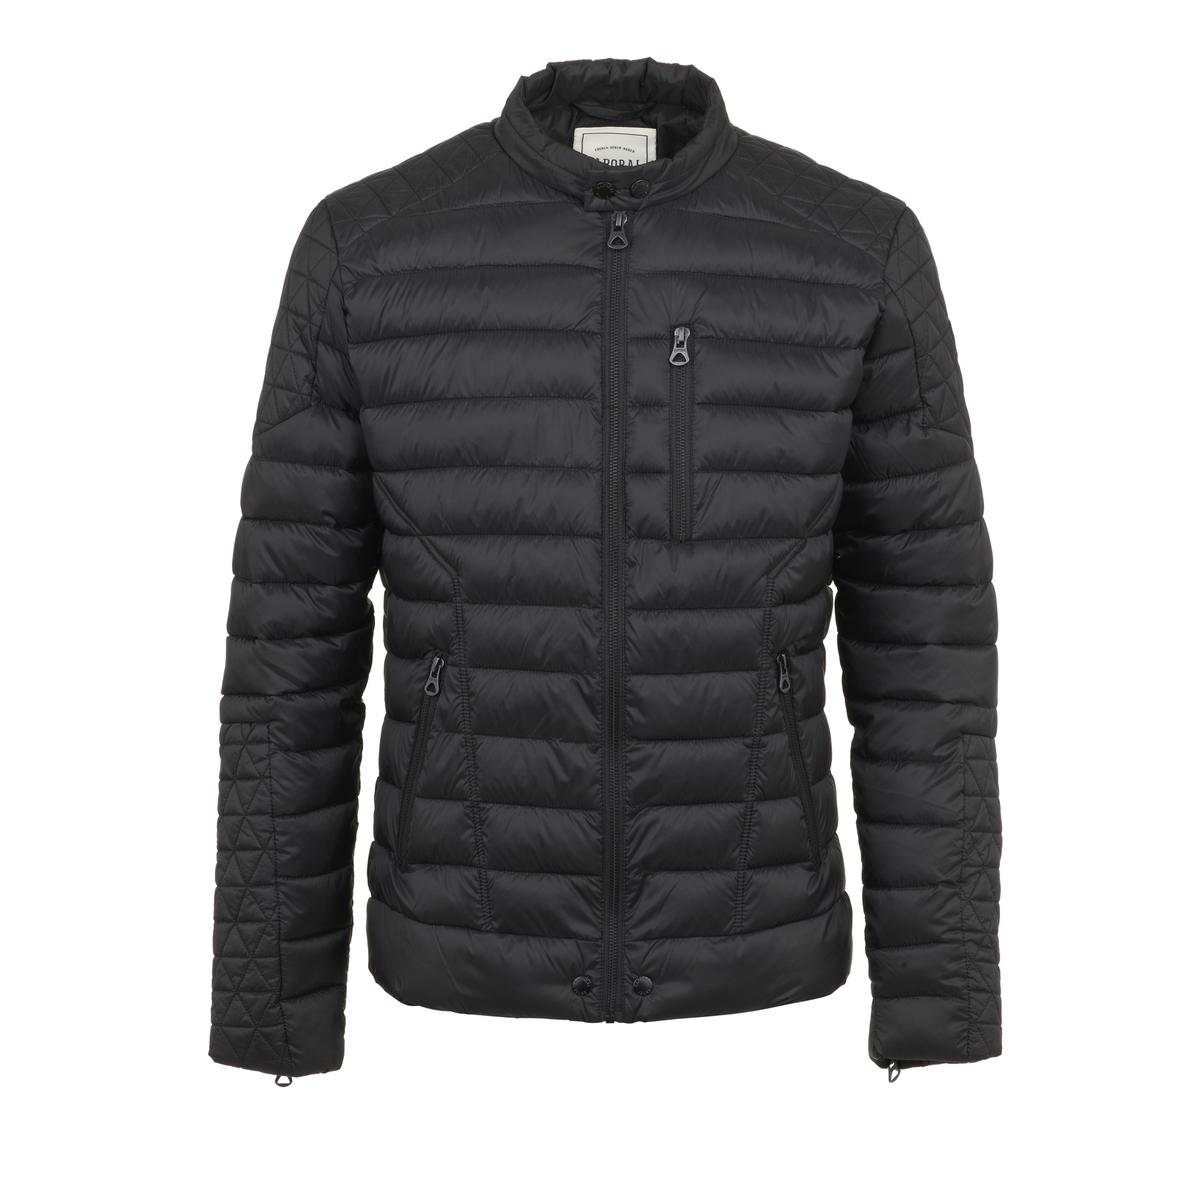 Блузон La Redoute В байкерском стиле Ozone M черный свитшот la redoute с логотипом в винтажном стиле la redoute m белый